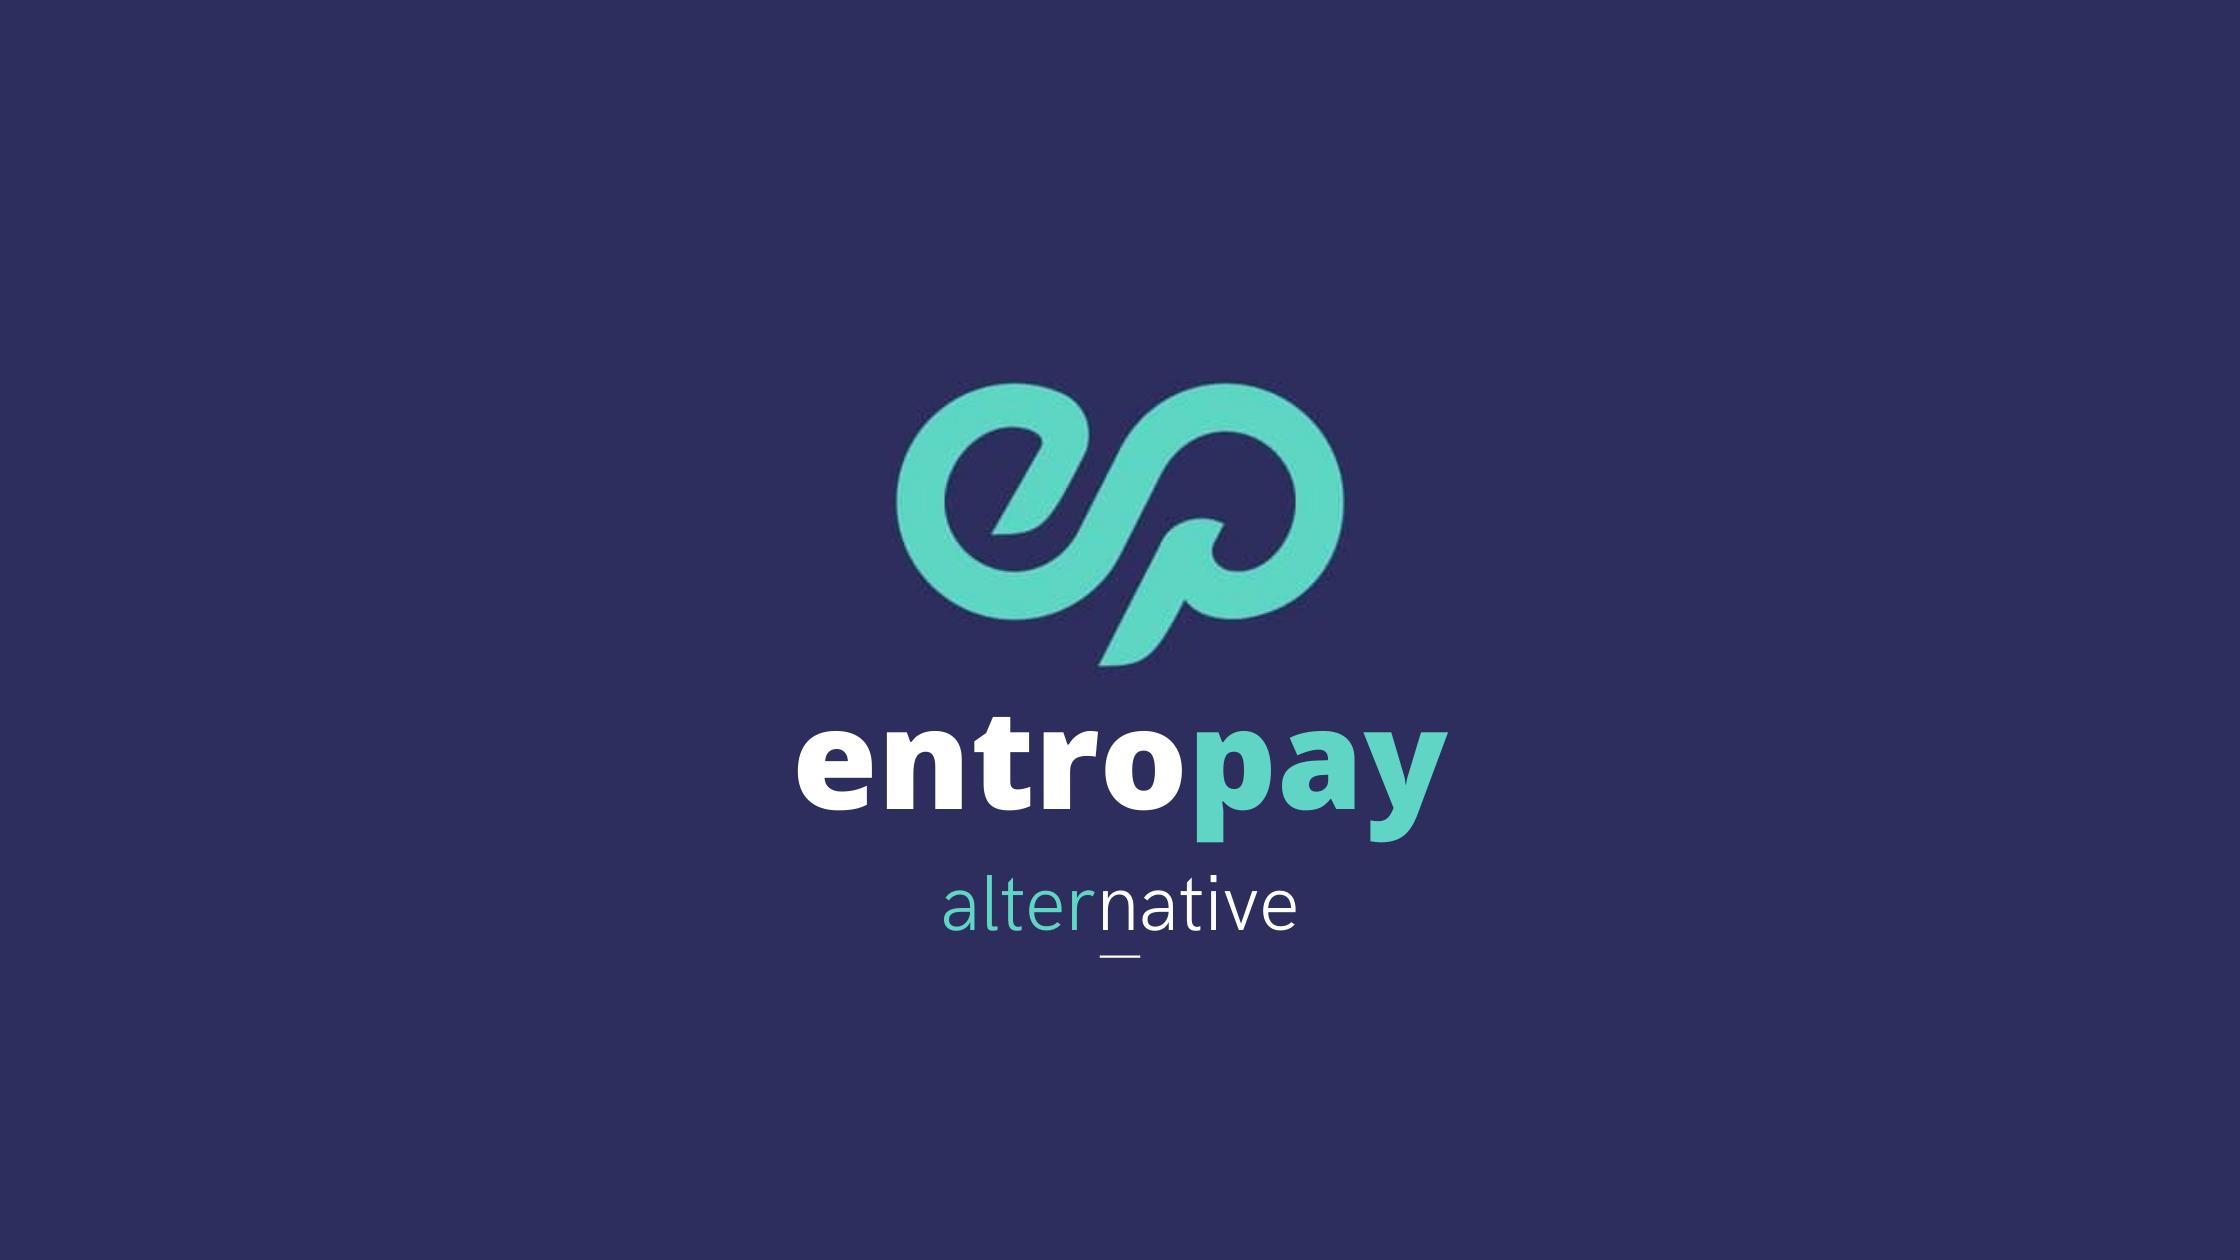 Entropay Alternative